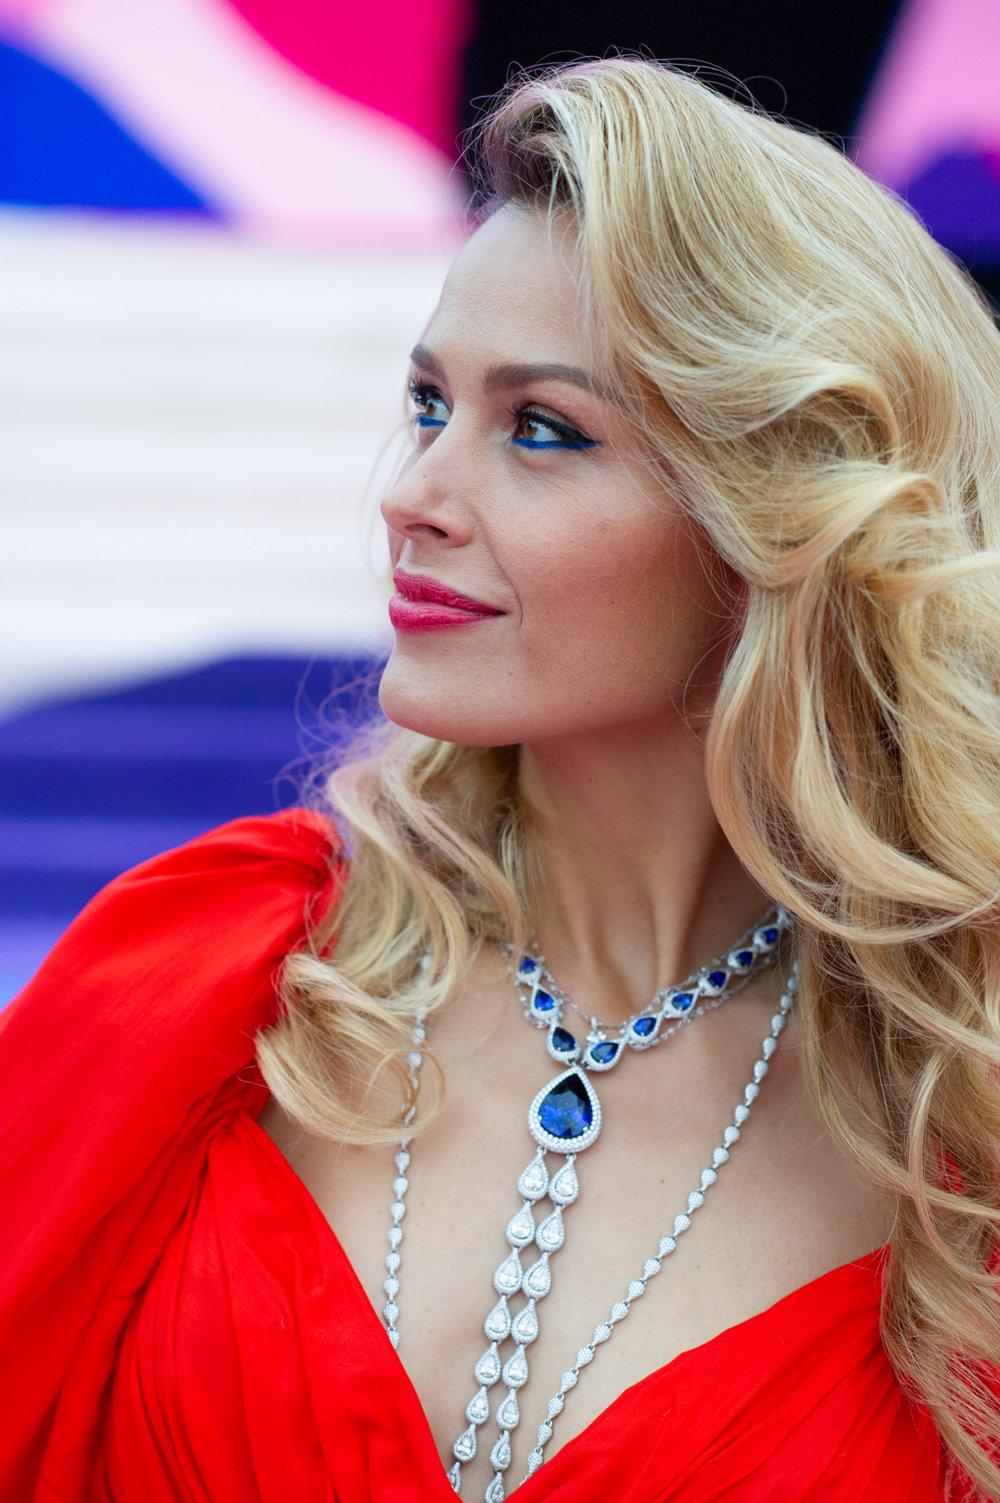 Petra Nemcova眼下藍色眼線就如頸鍊上的藍寶石一樣迷人